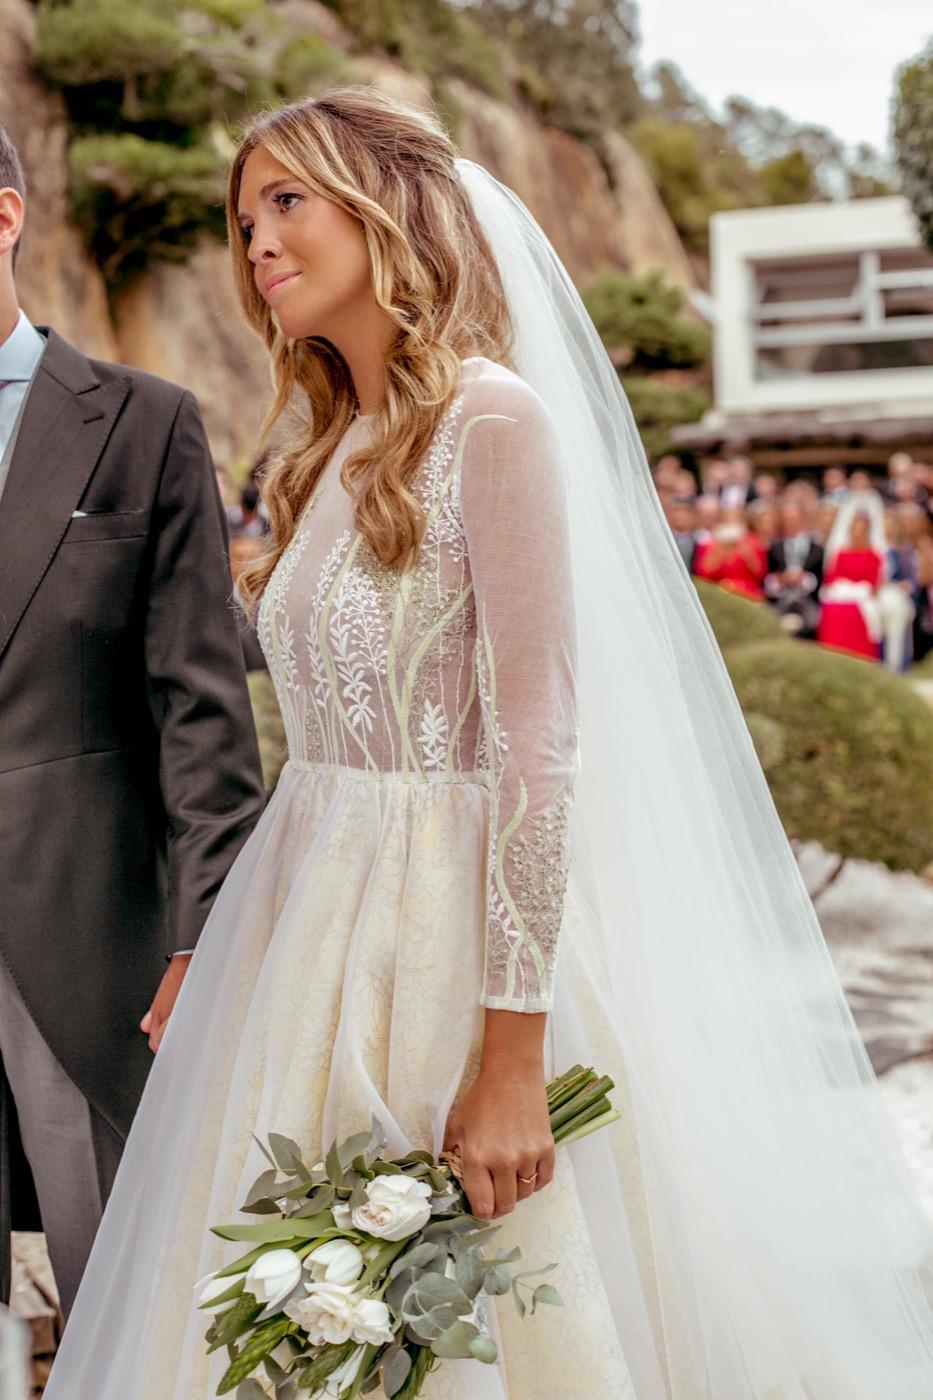 Best+Wedding+Planner+Spainselección2